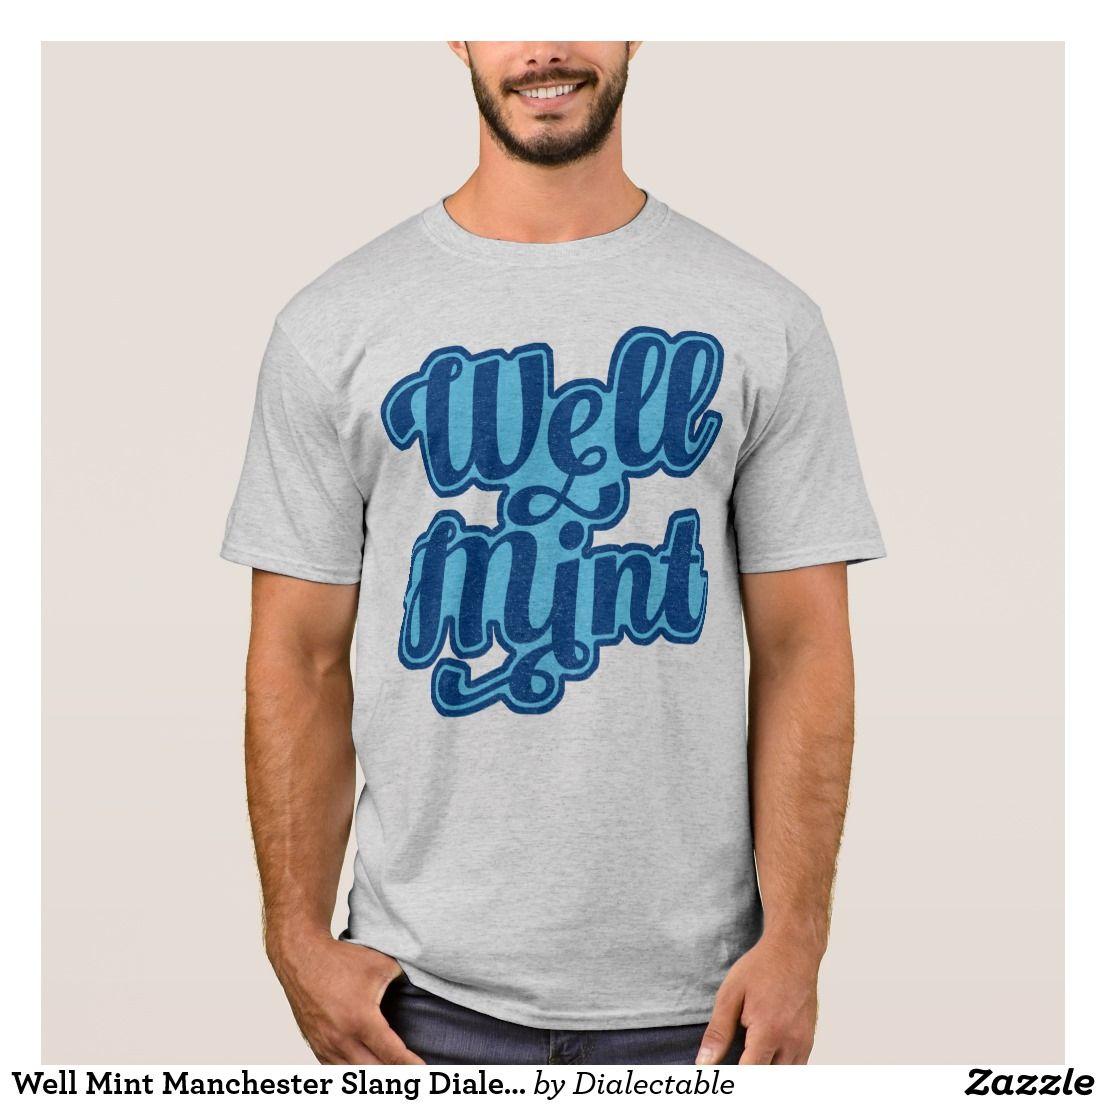 100/% Mancunian Manchester British Mancunian Mens T-Shirt